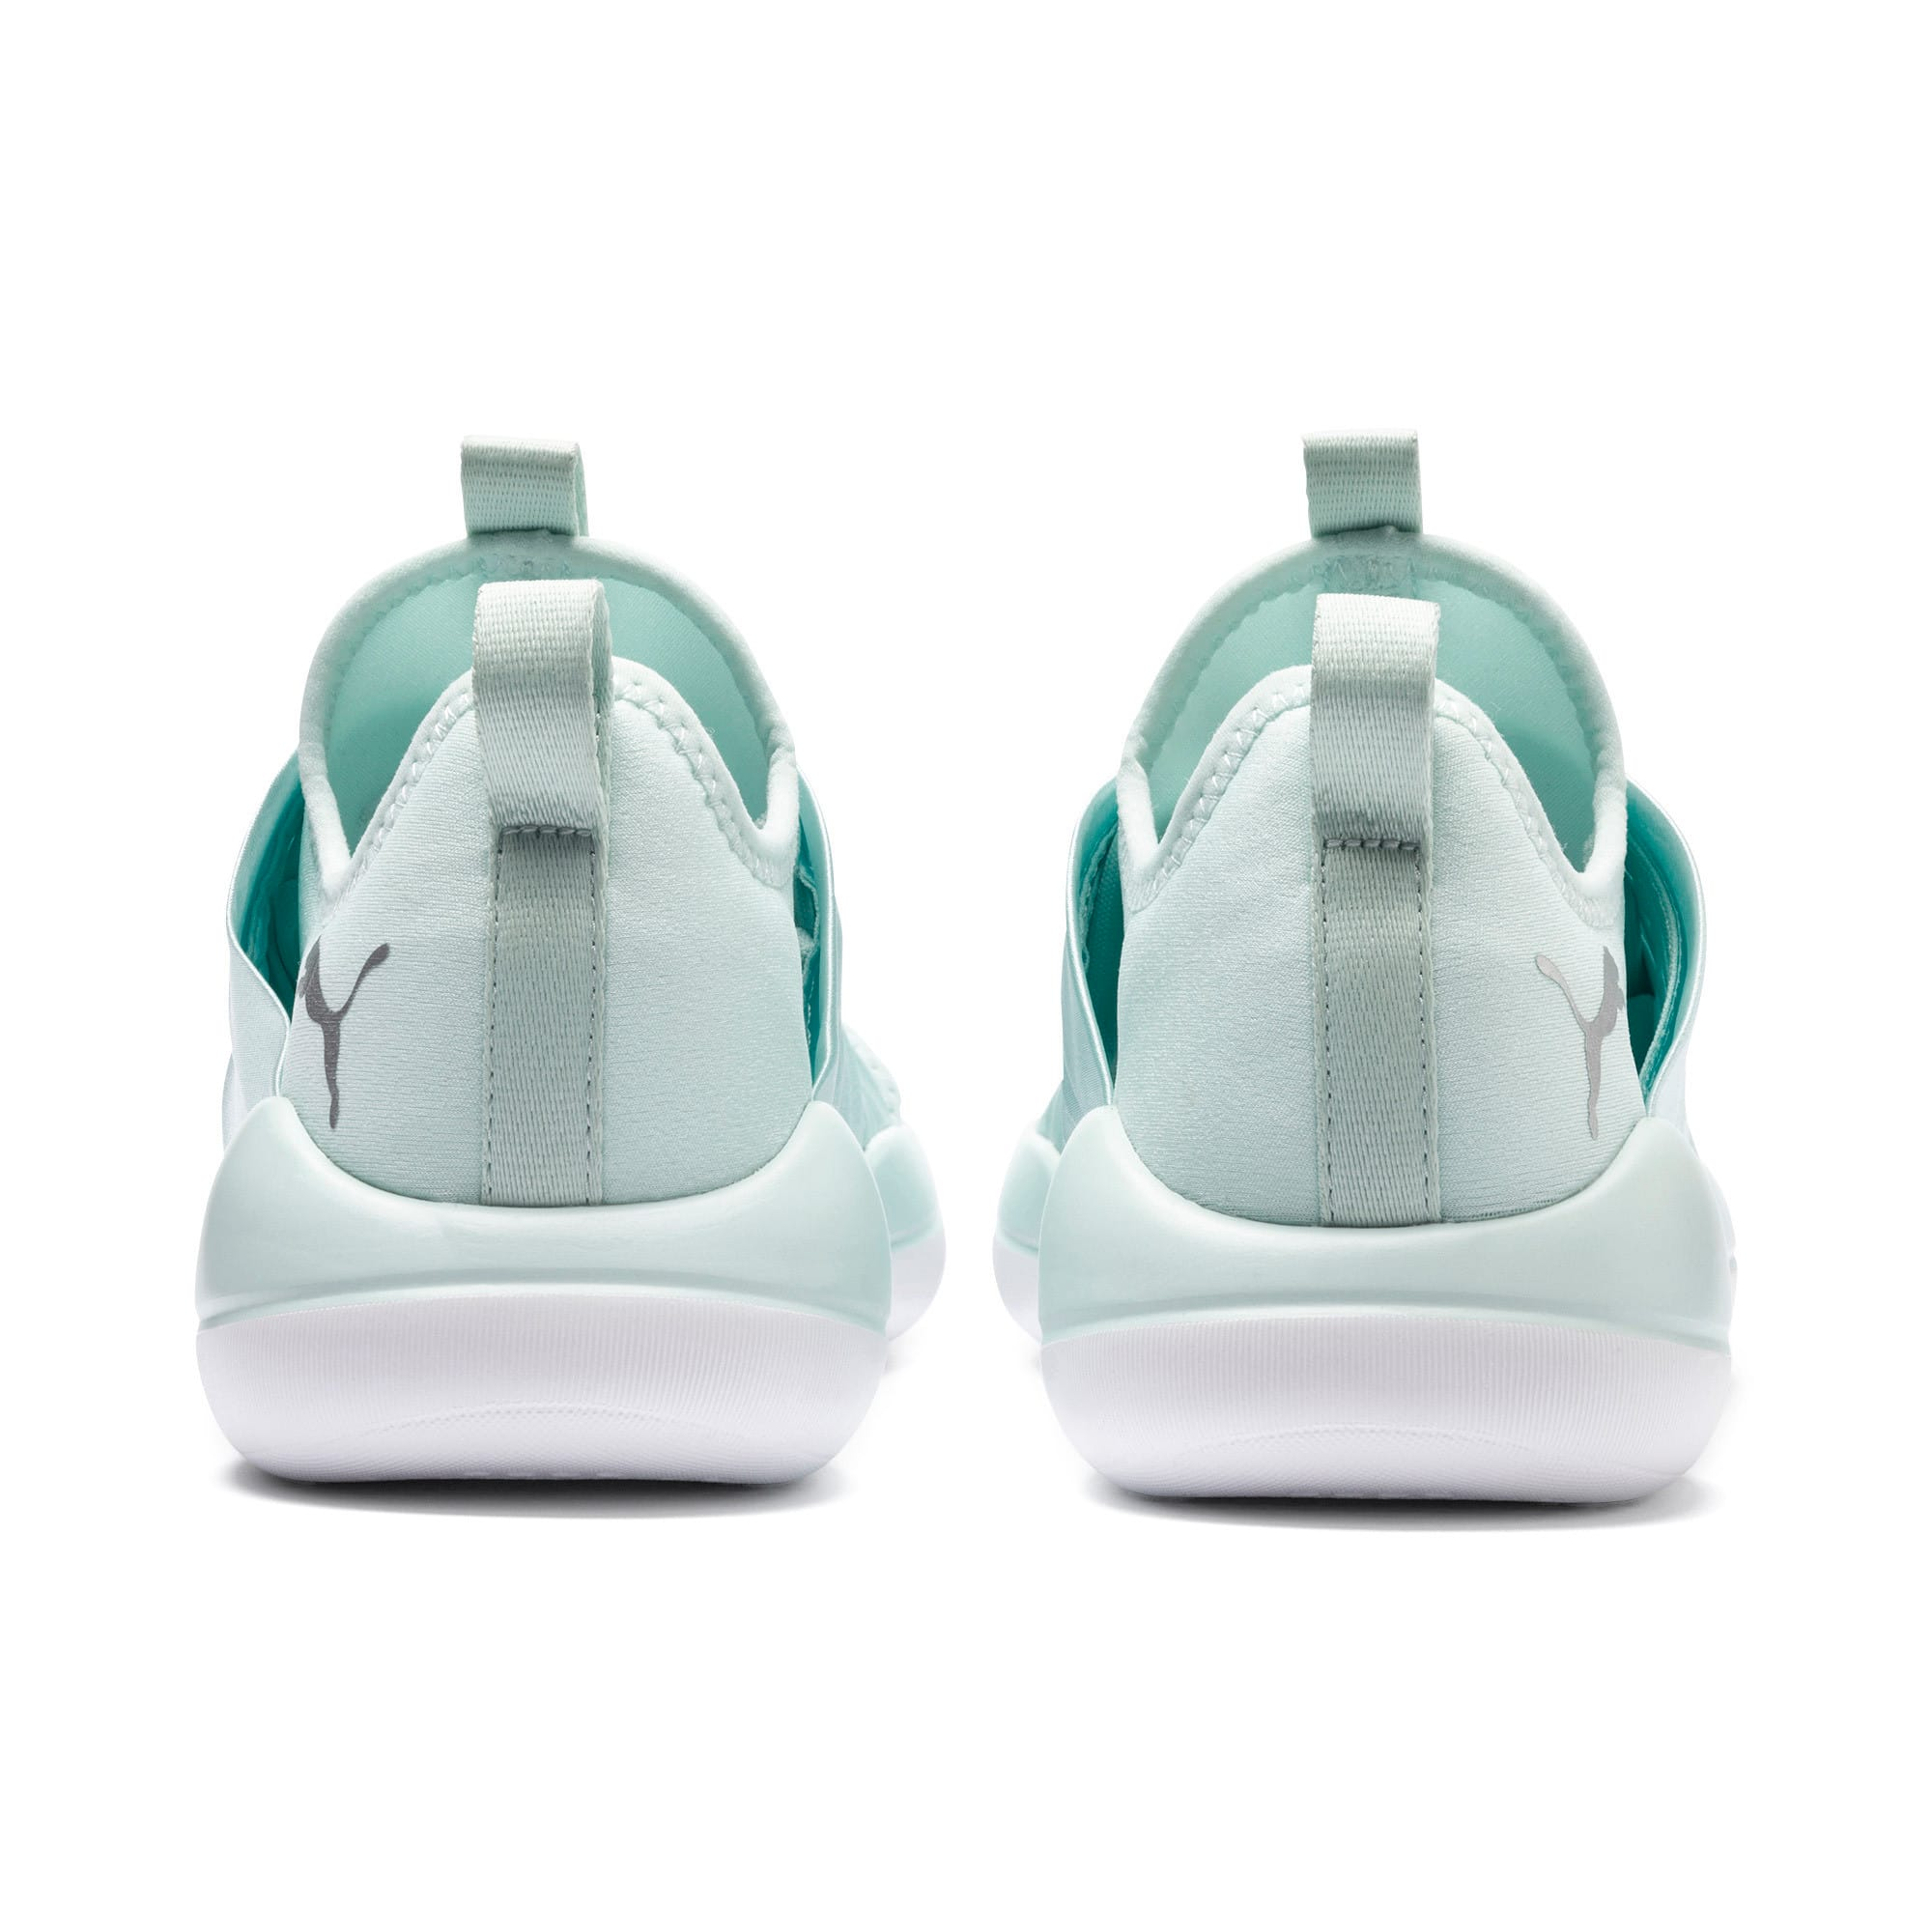 Thumbnail 4 of Flourish Cosmic Women's Training Shoes, Fair Aqua-Puma White, medium